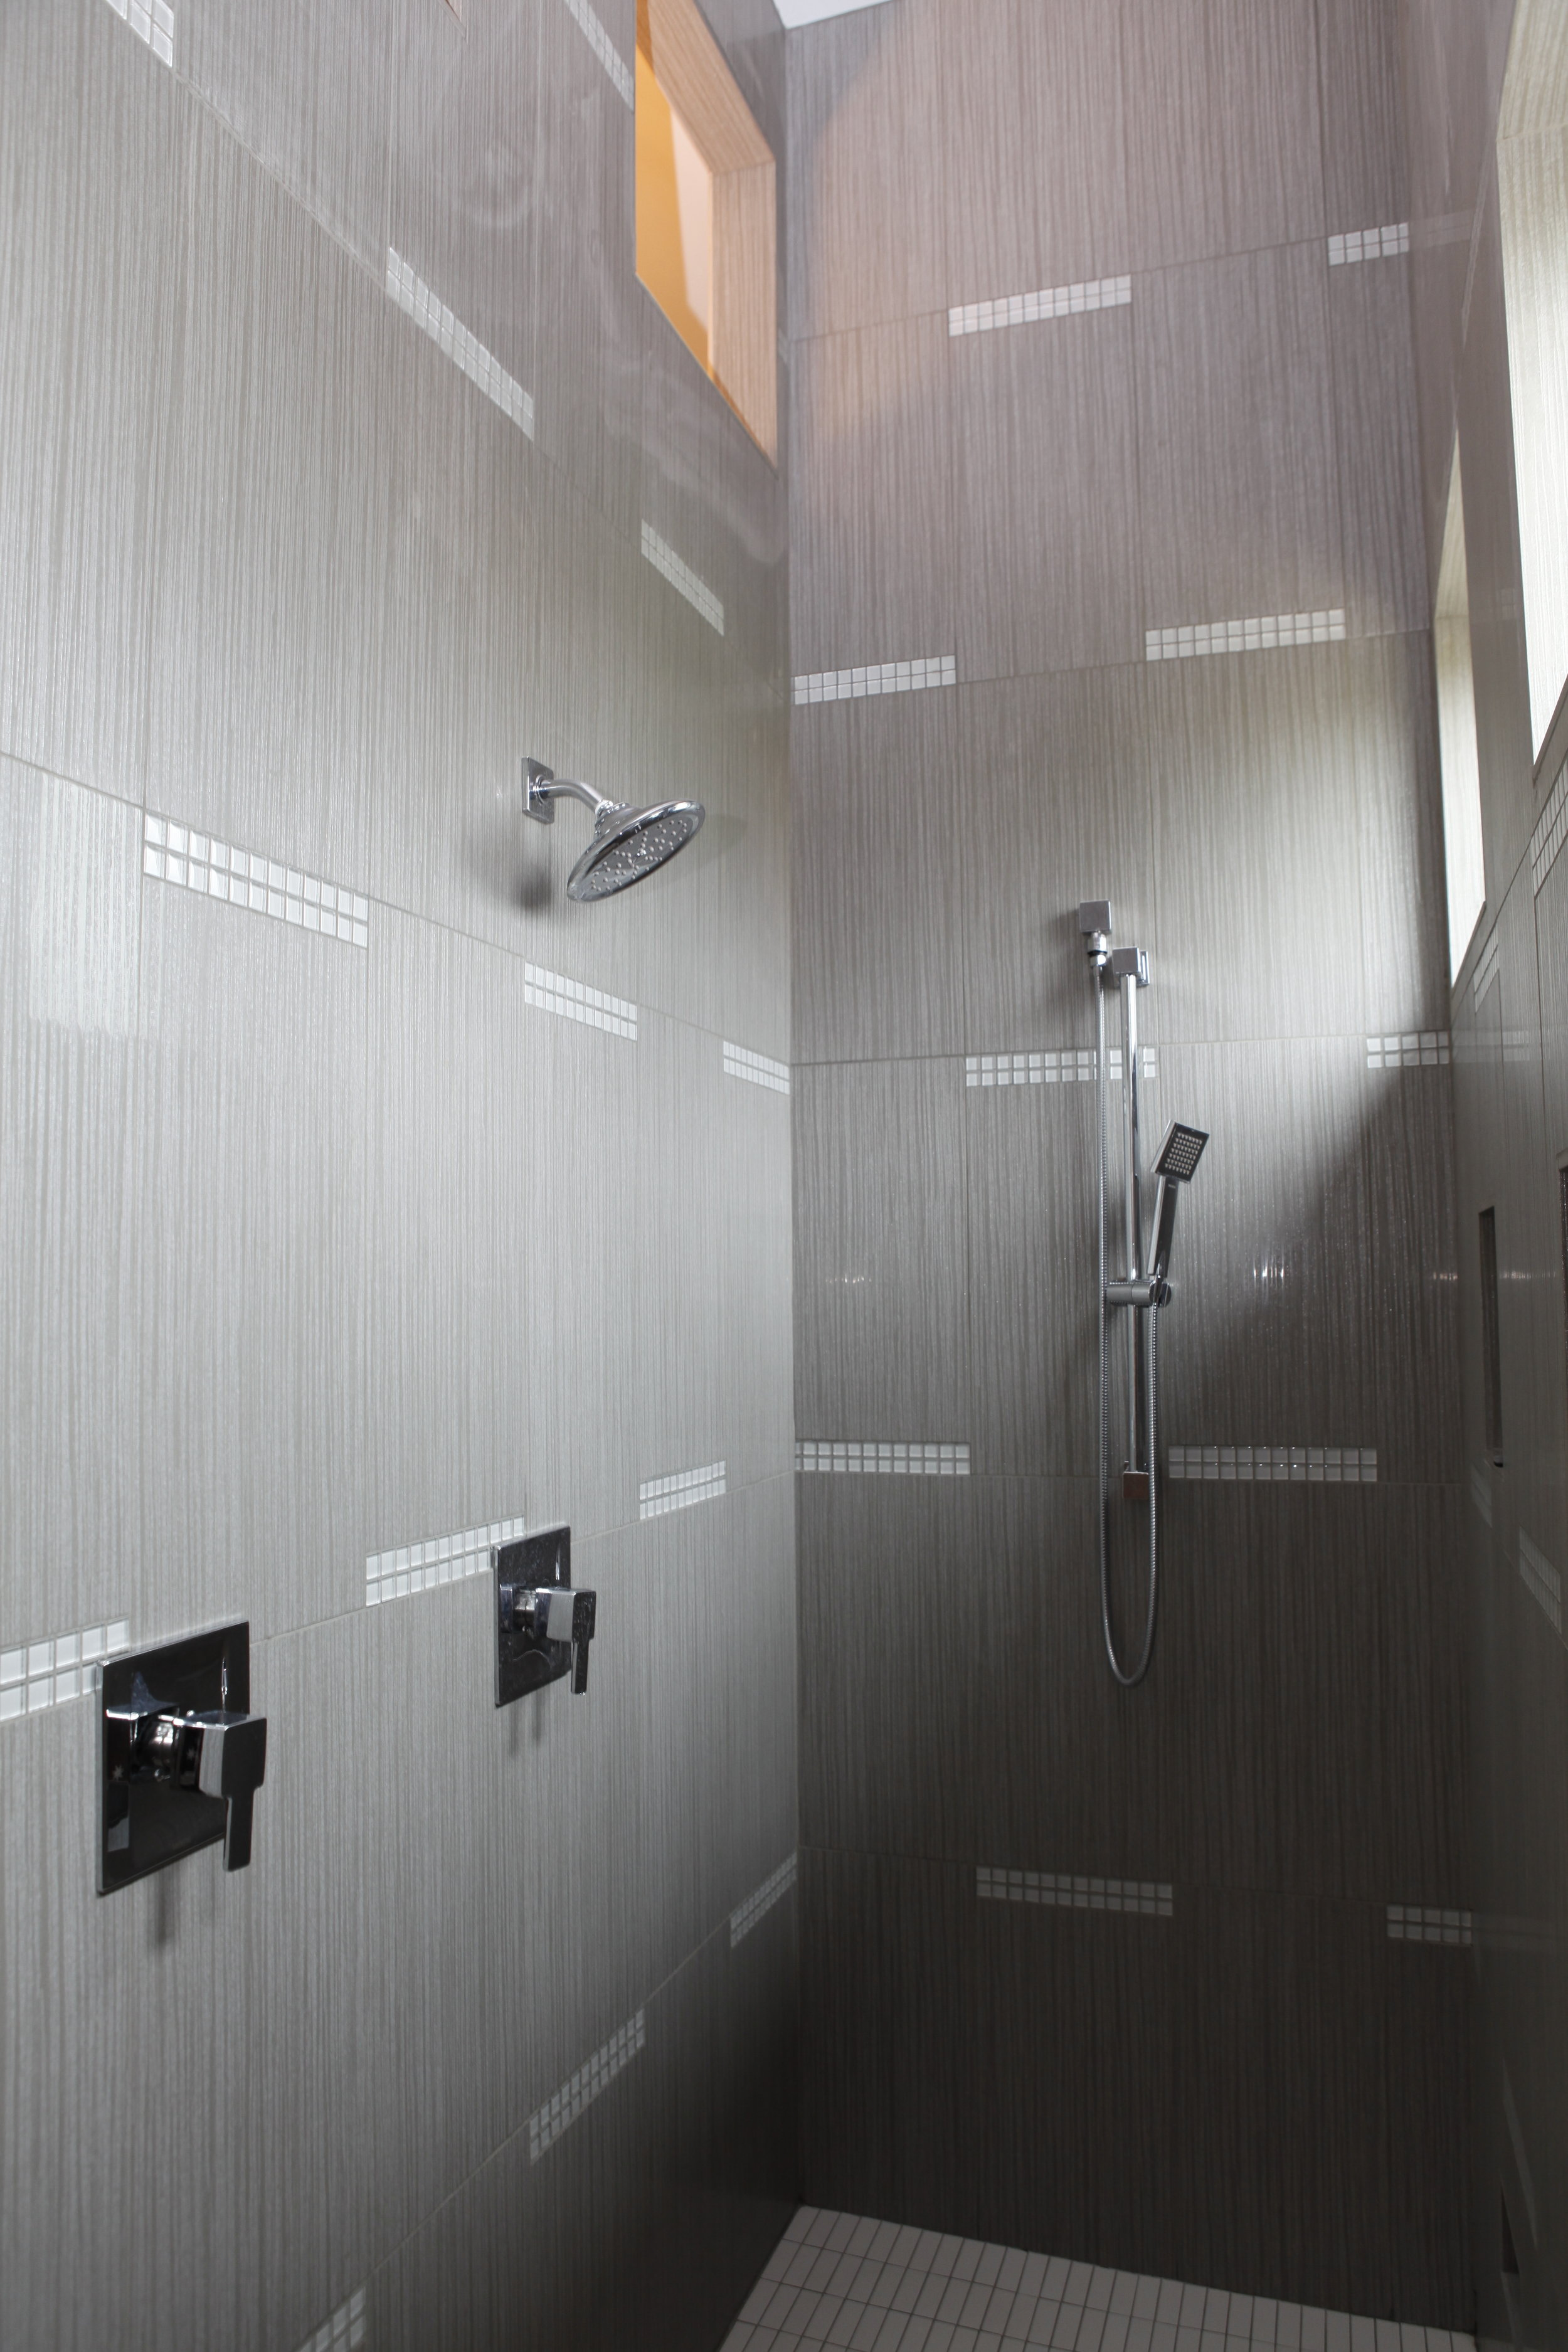 22-Zen Gardens Way - MBR Bath - Shower.JPG